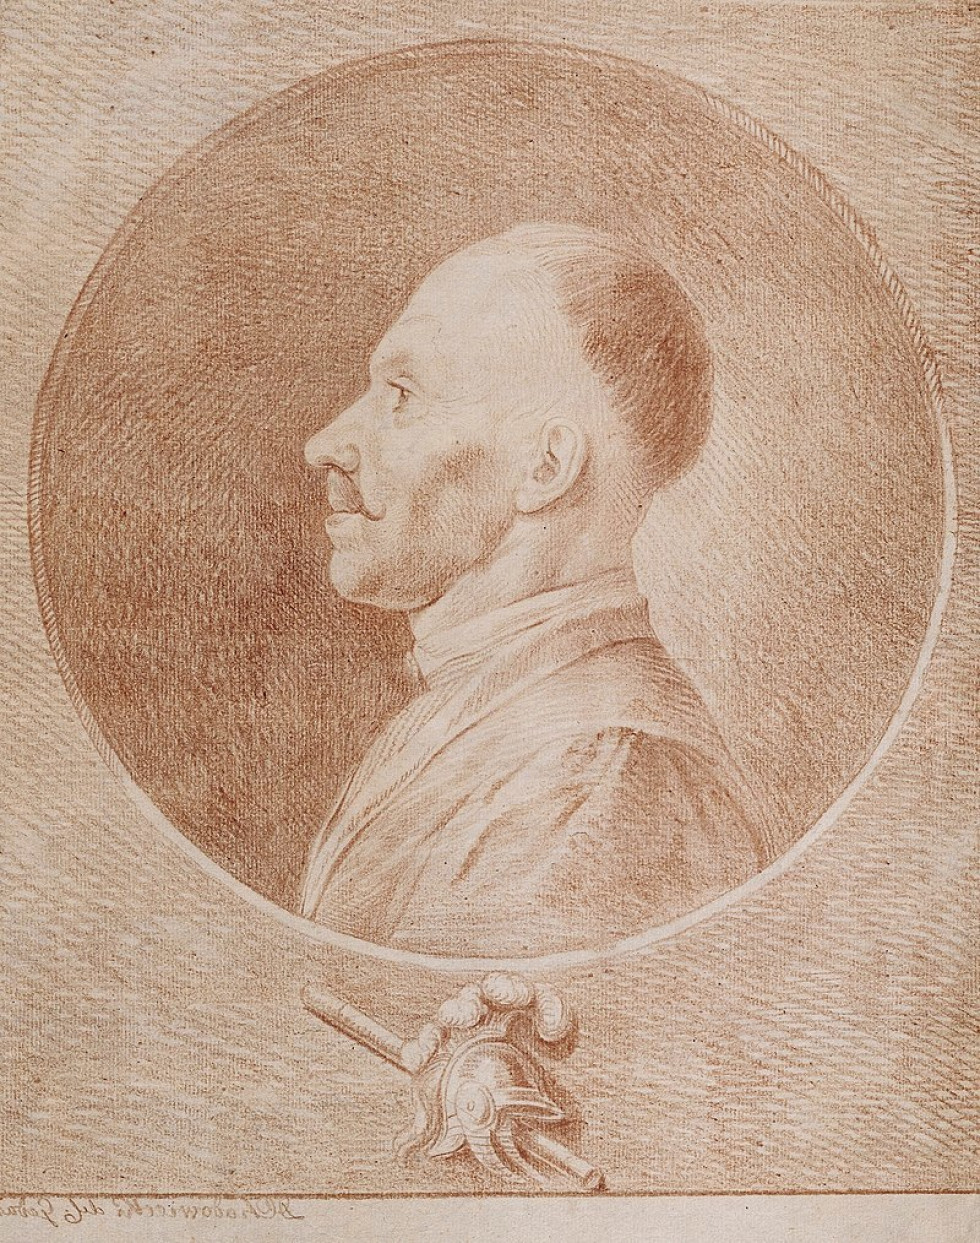 Францішек Чацький, 1773 р. cyfrowe.mnw.art.pl